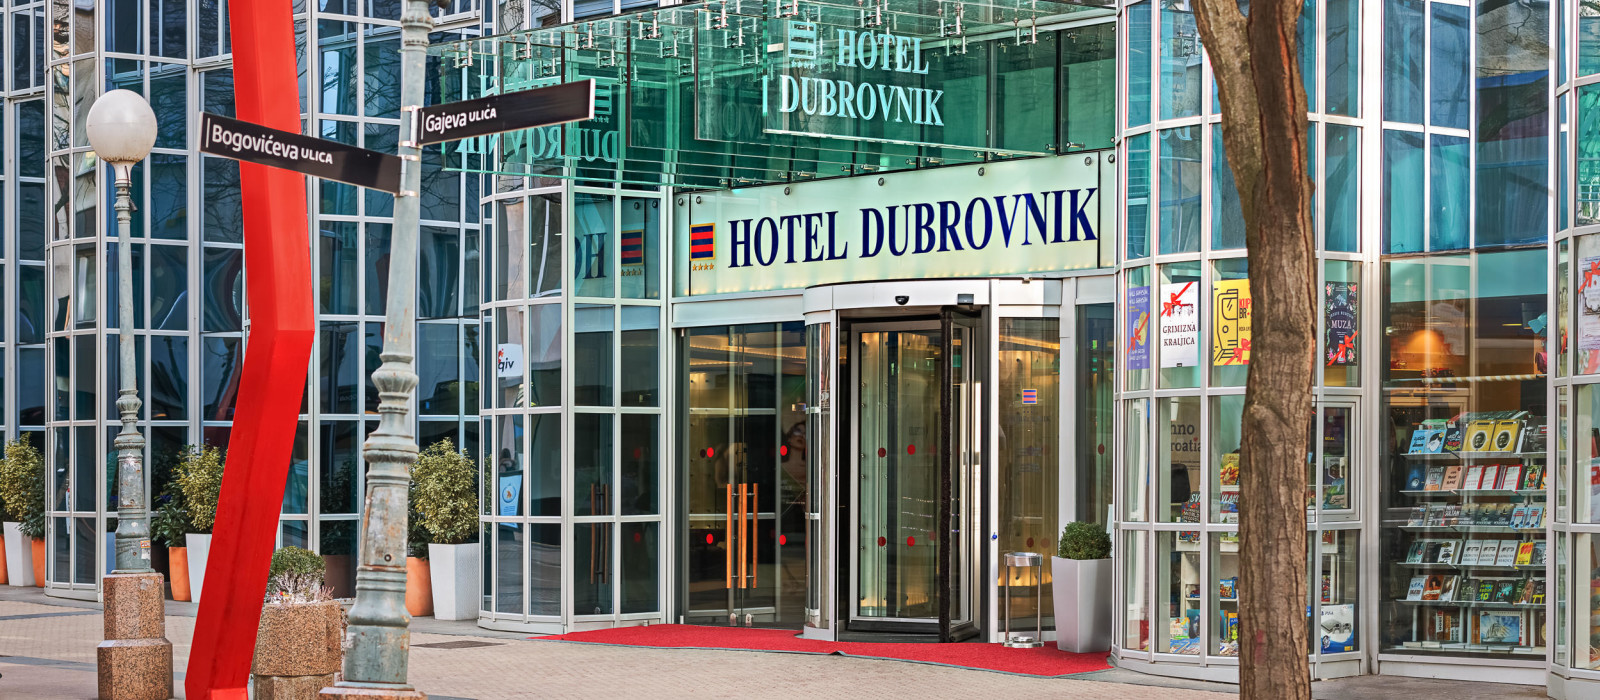 Hotel Dubrovnik  Croatia & Slovenia